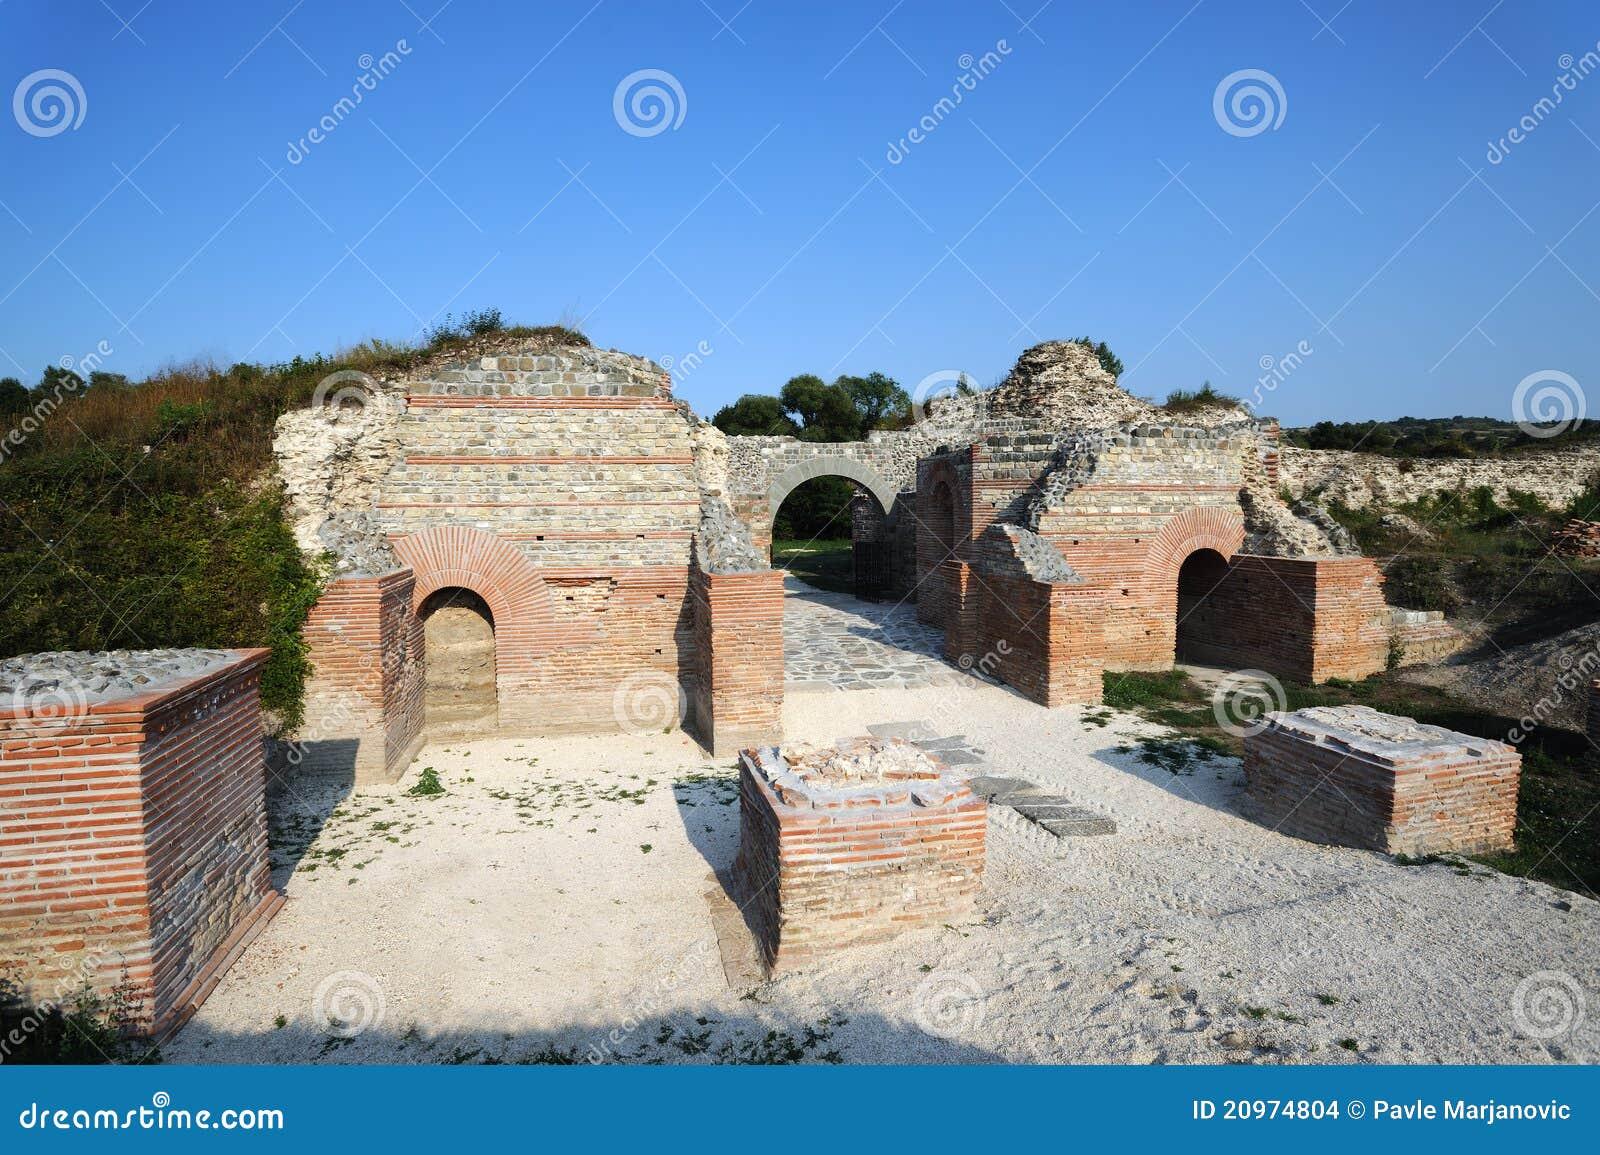 Ancient Roman site Felix Romuliana